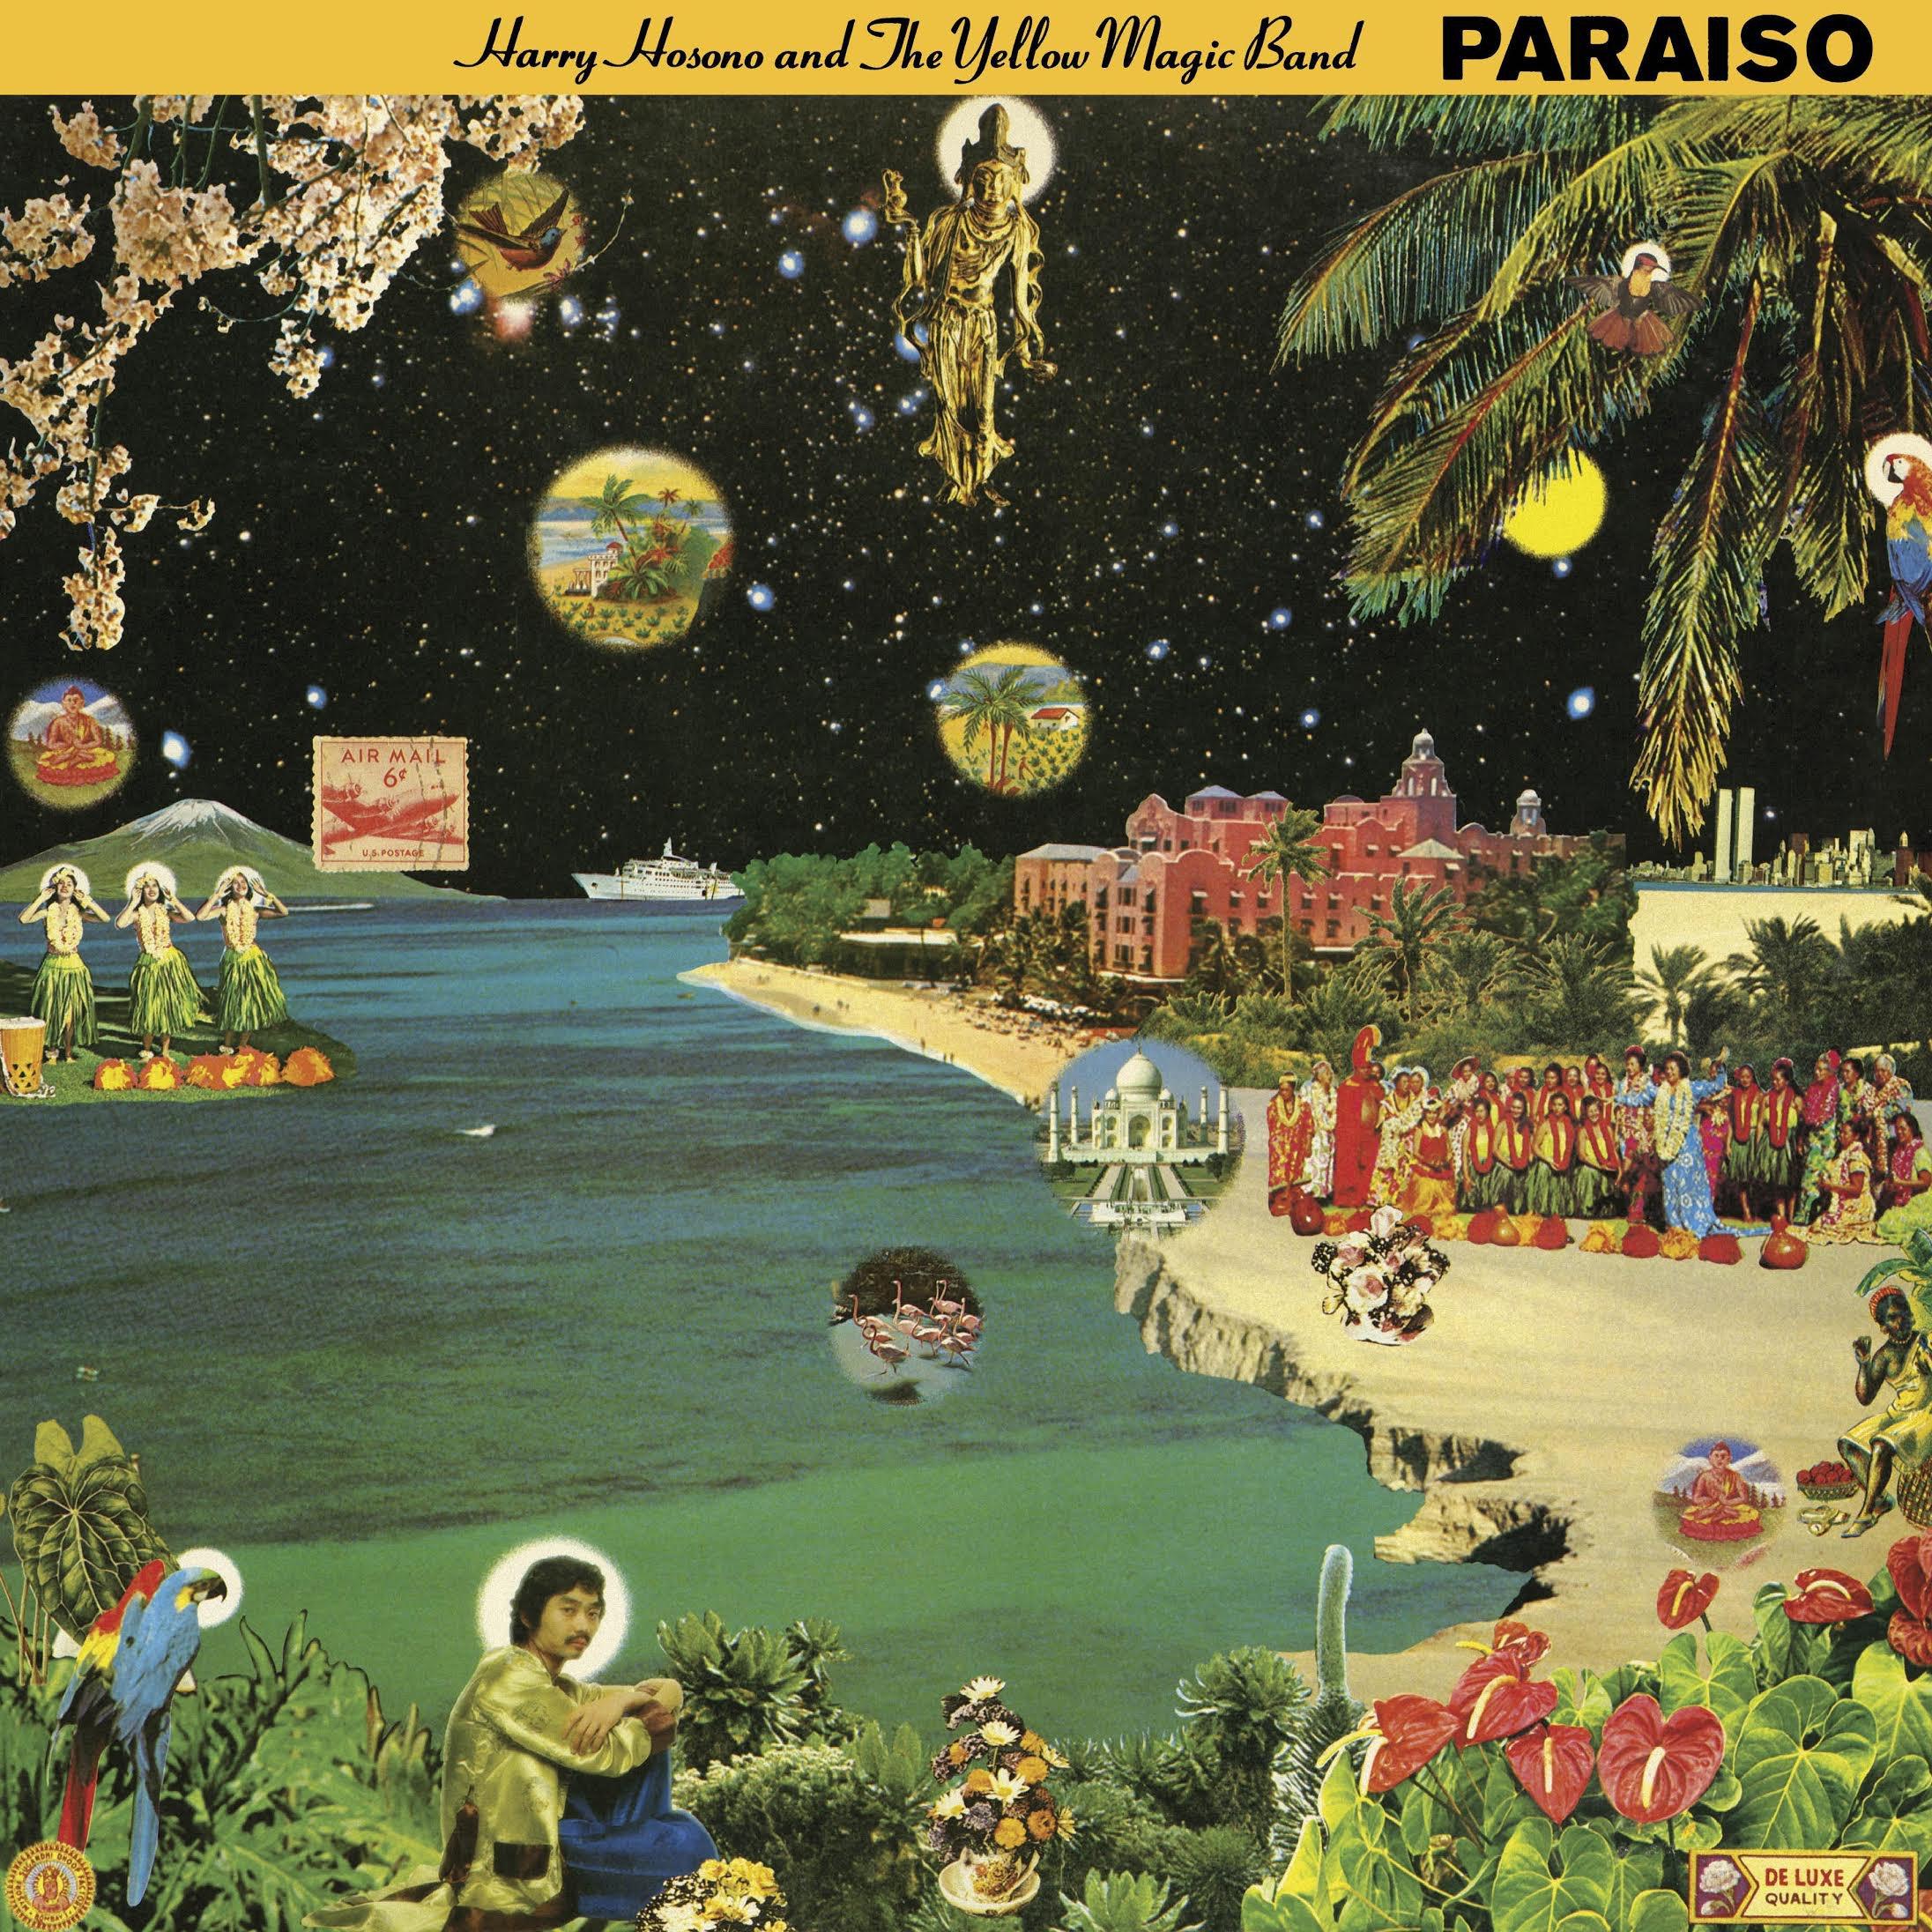 Vinilo : Haruomi Hosono - Paraiso (Gatefold LP Jacket, Limited Edition, Reissue)